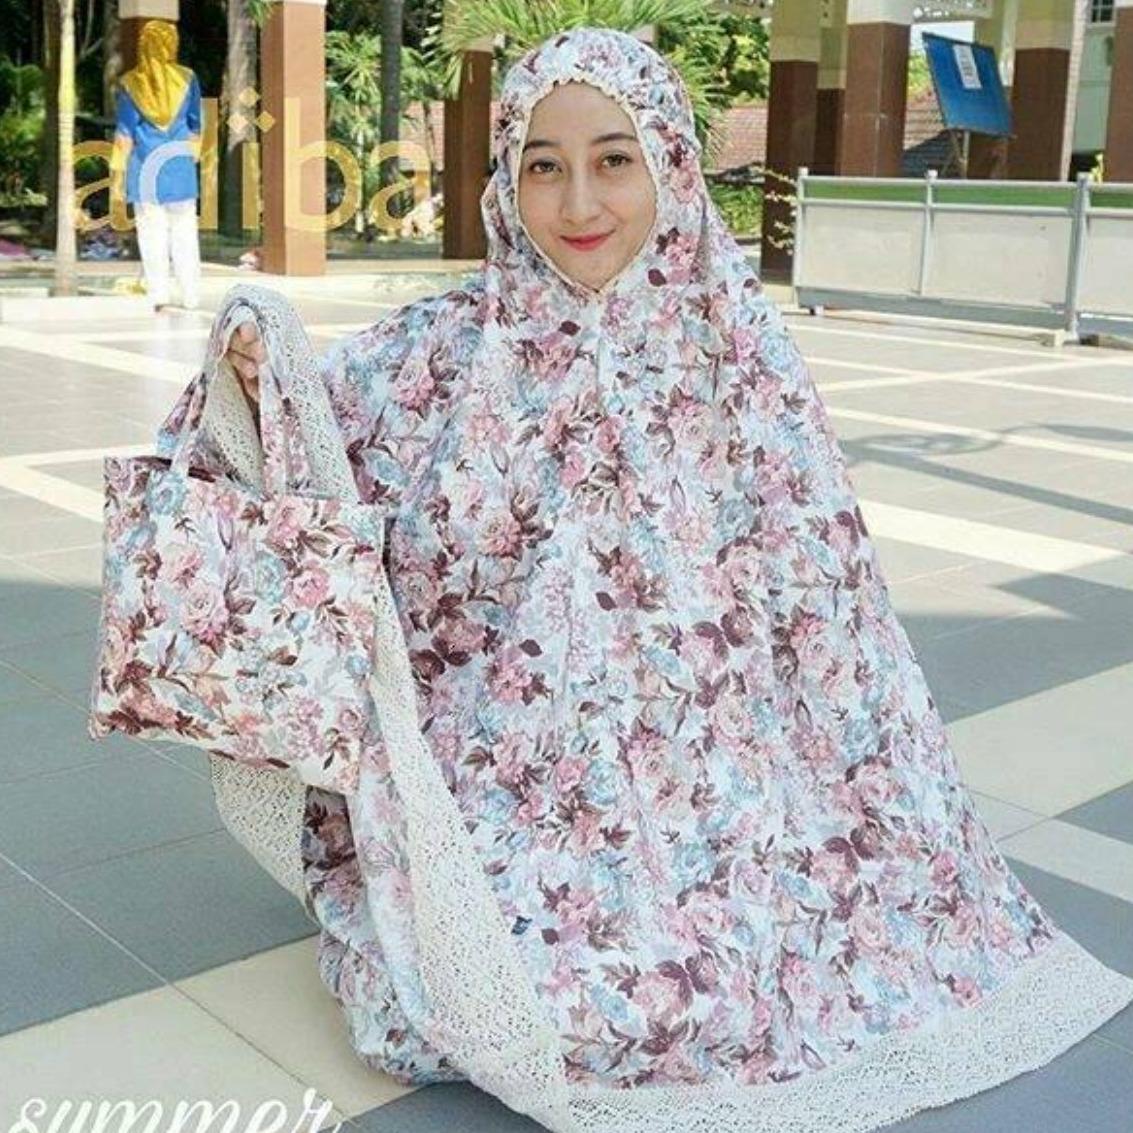 Jual Aneka Mukena Model Terbaru Spandek Lace Katun Jepang Pink